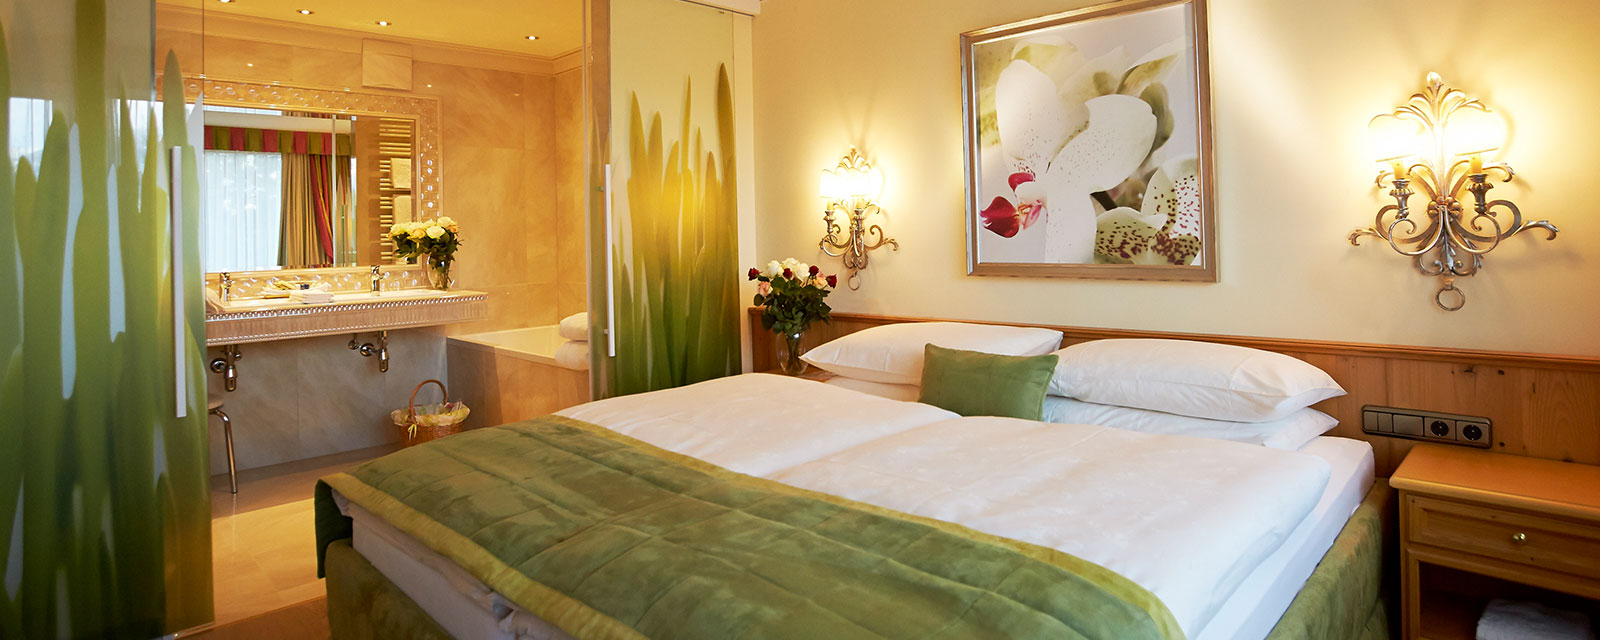 Tuina Massage (Tuina Anmo): Foto vom Wellnesshotel Hotel Salzburgerhof   Wellness Salzburger Land